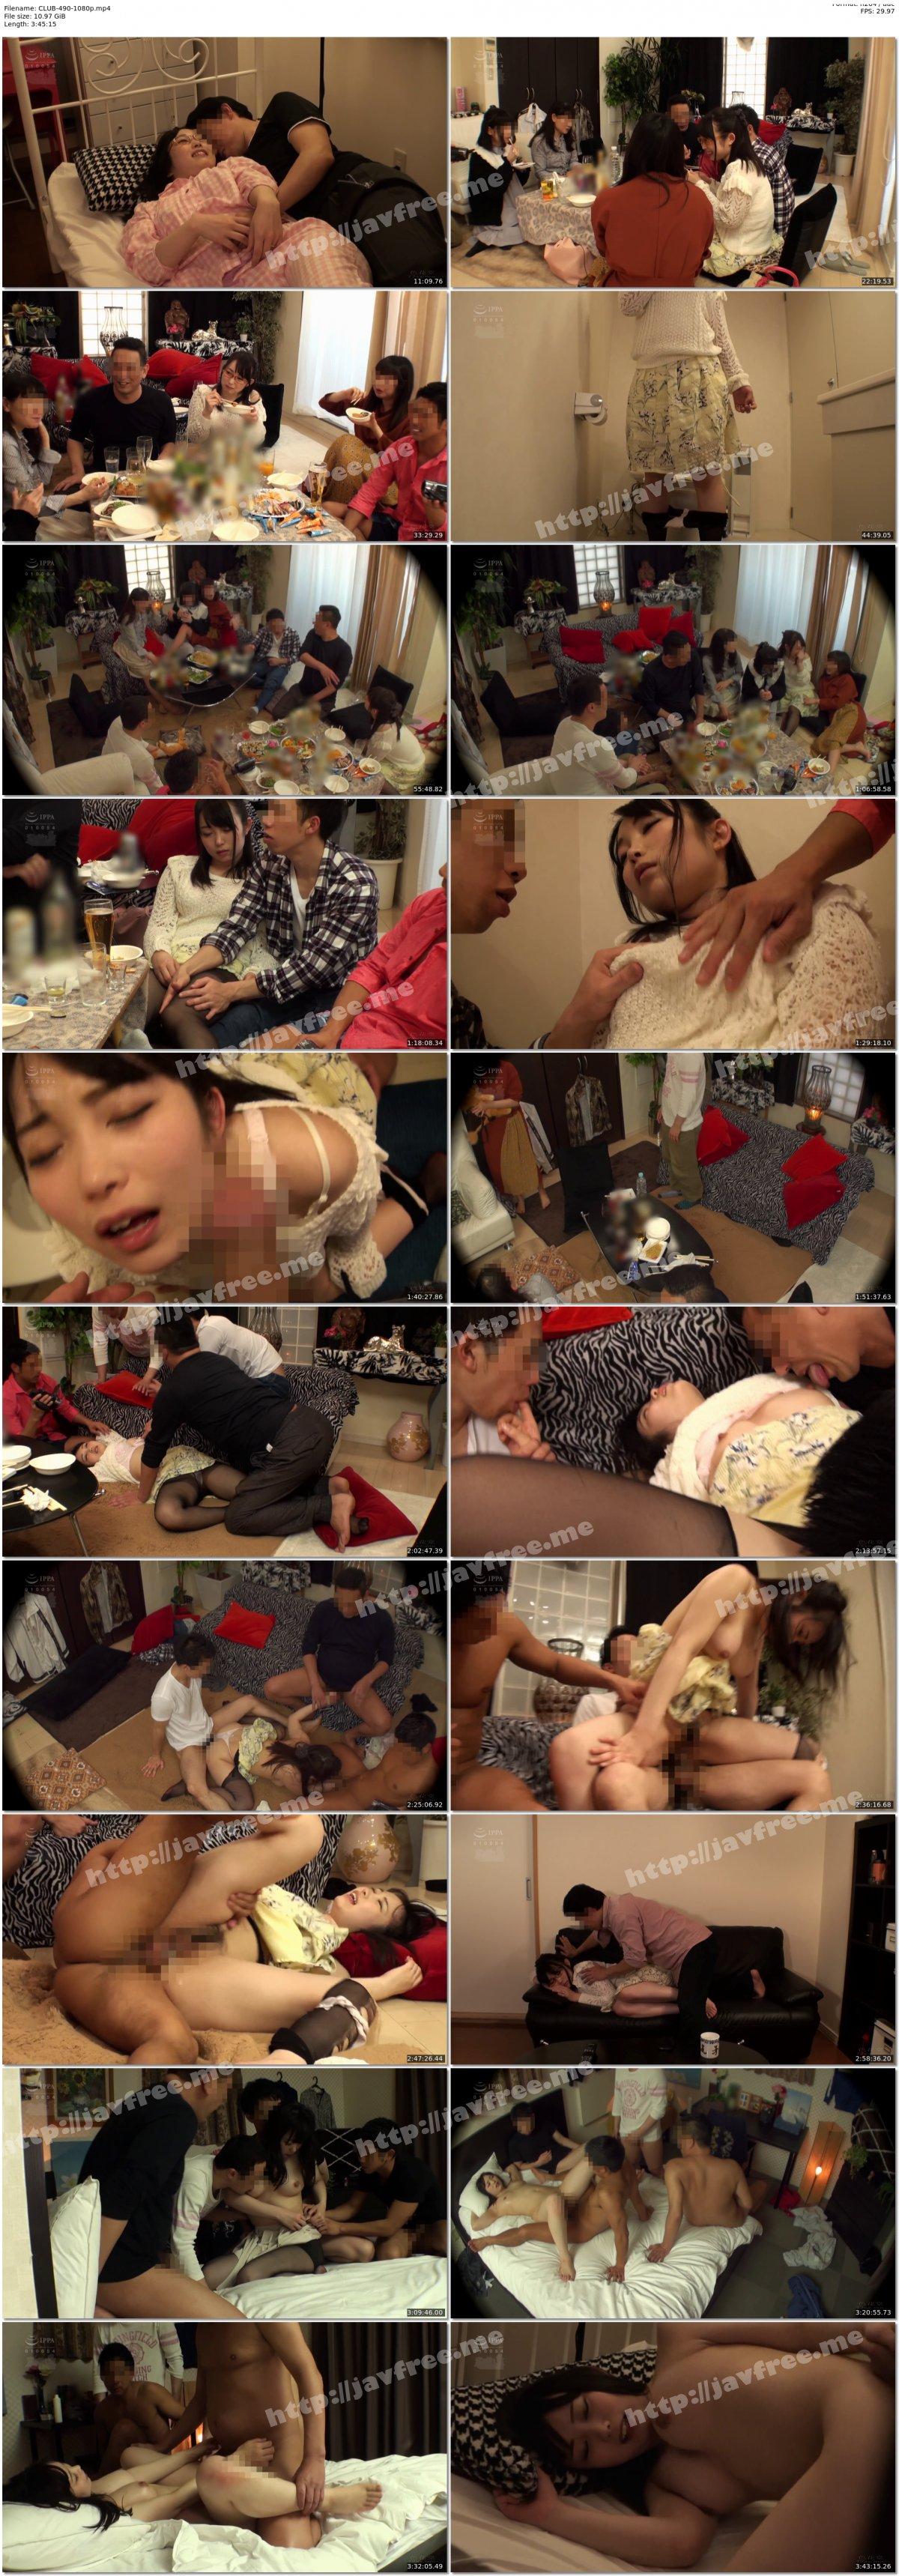 [HD][CLUB-490] 寿退社する妻の送別会ビデオ 僕の愛しい嫁さんが酒に呑まれ会社の上司や同僚に寝取られました。其の13 - image CLUB-490-1080p on https://javfree.me